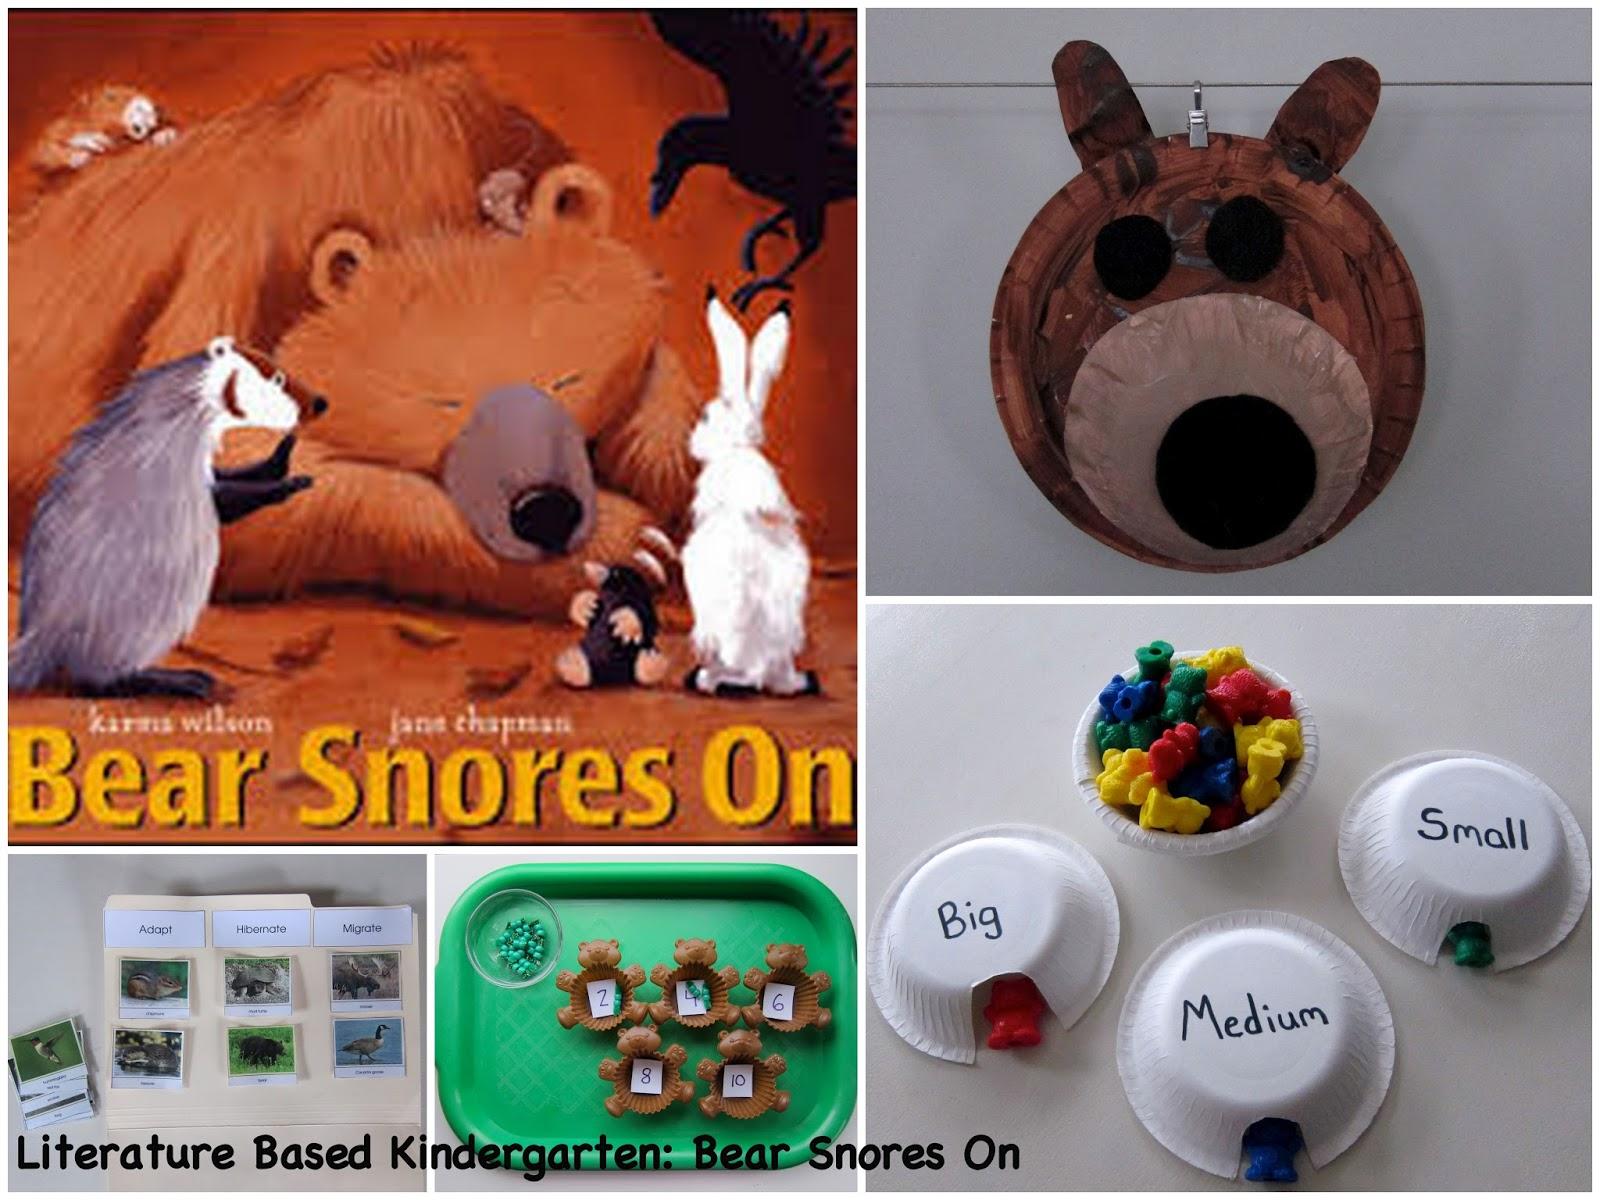 Literature Based Kindergarten Bear Snores On